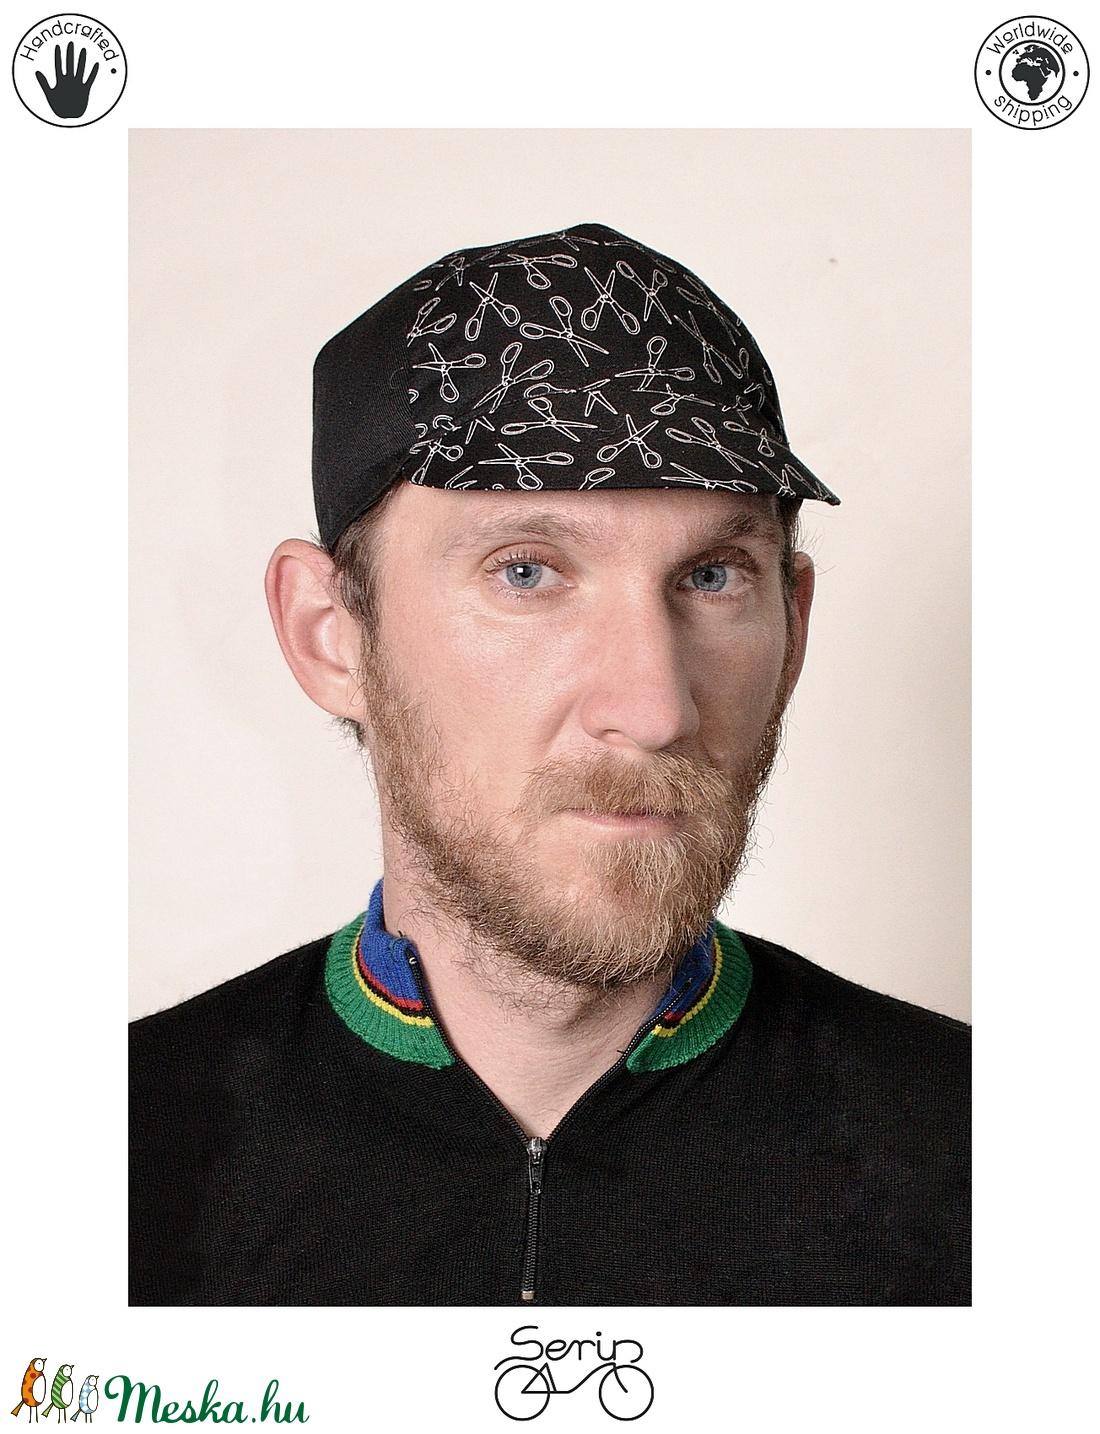 Serin  olló mintás biciklis sapka (serin) - Meska.hu